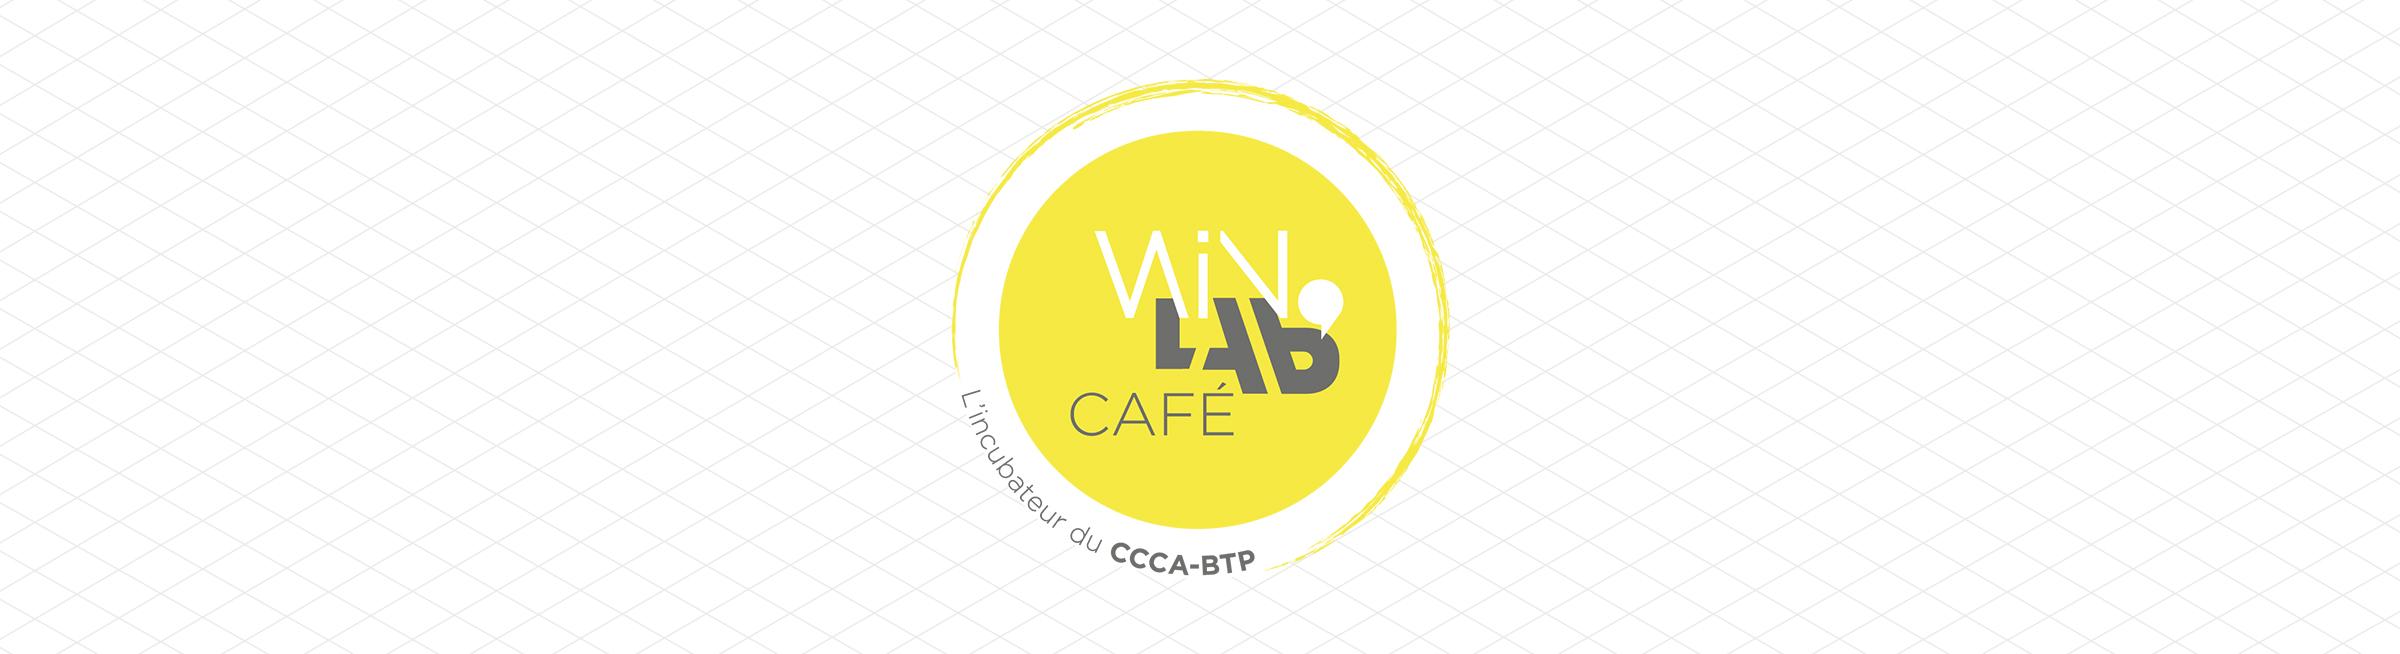 Création logo WinLab' café